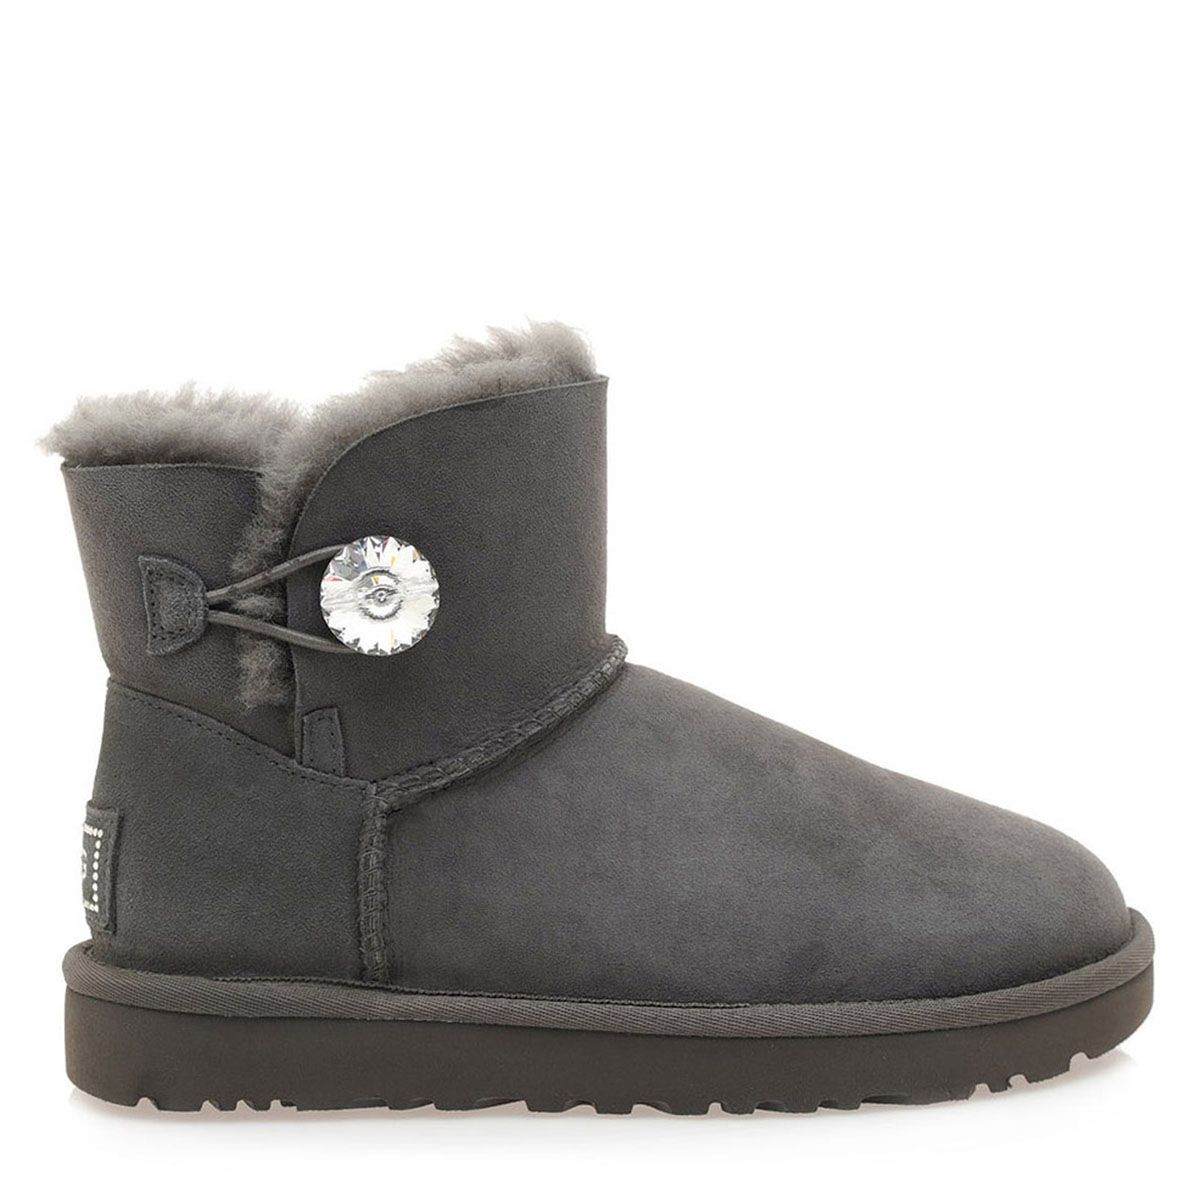 SNOW BOOTS σχέδιο: N310Y5541